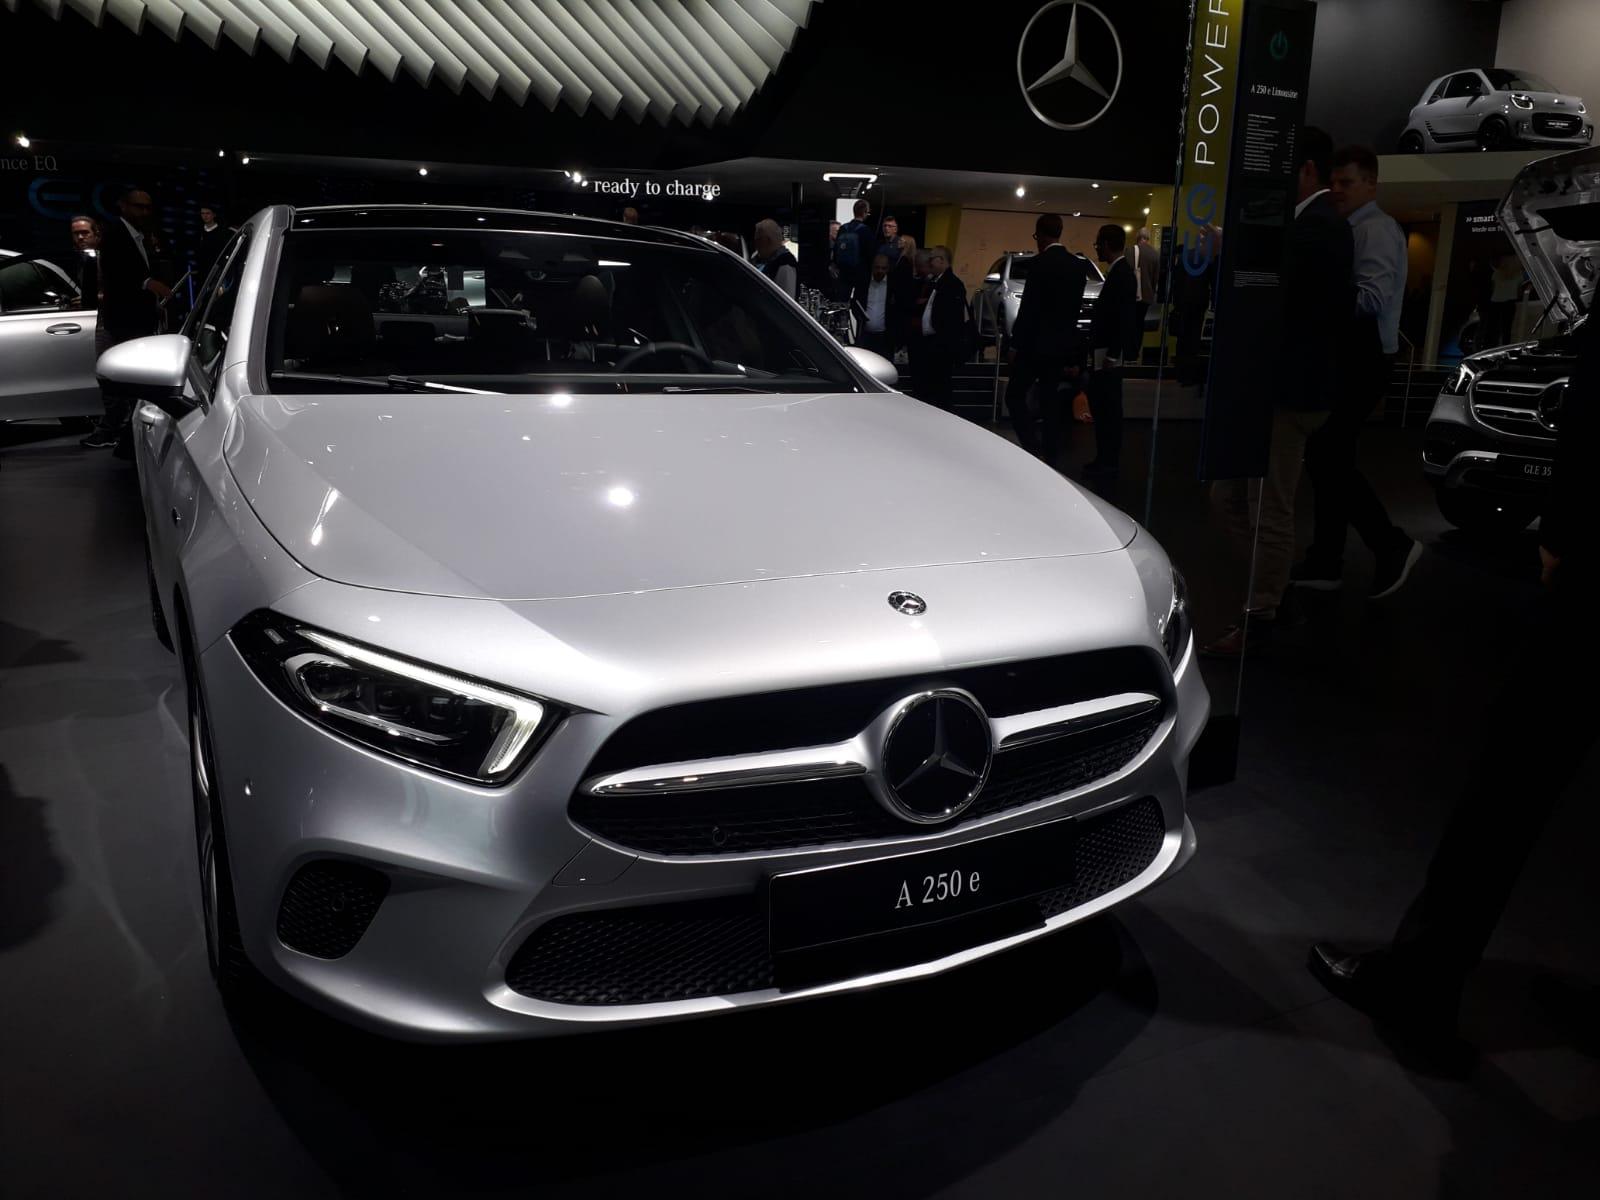 Mercedes Classe A Ibrida